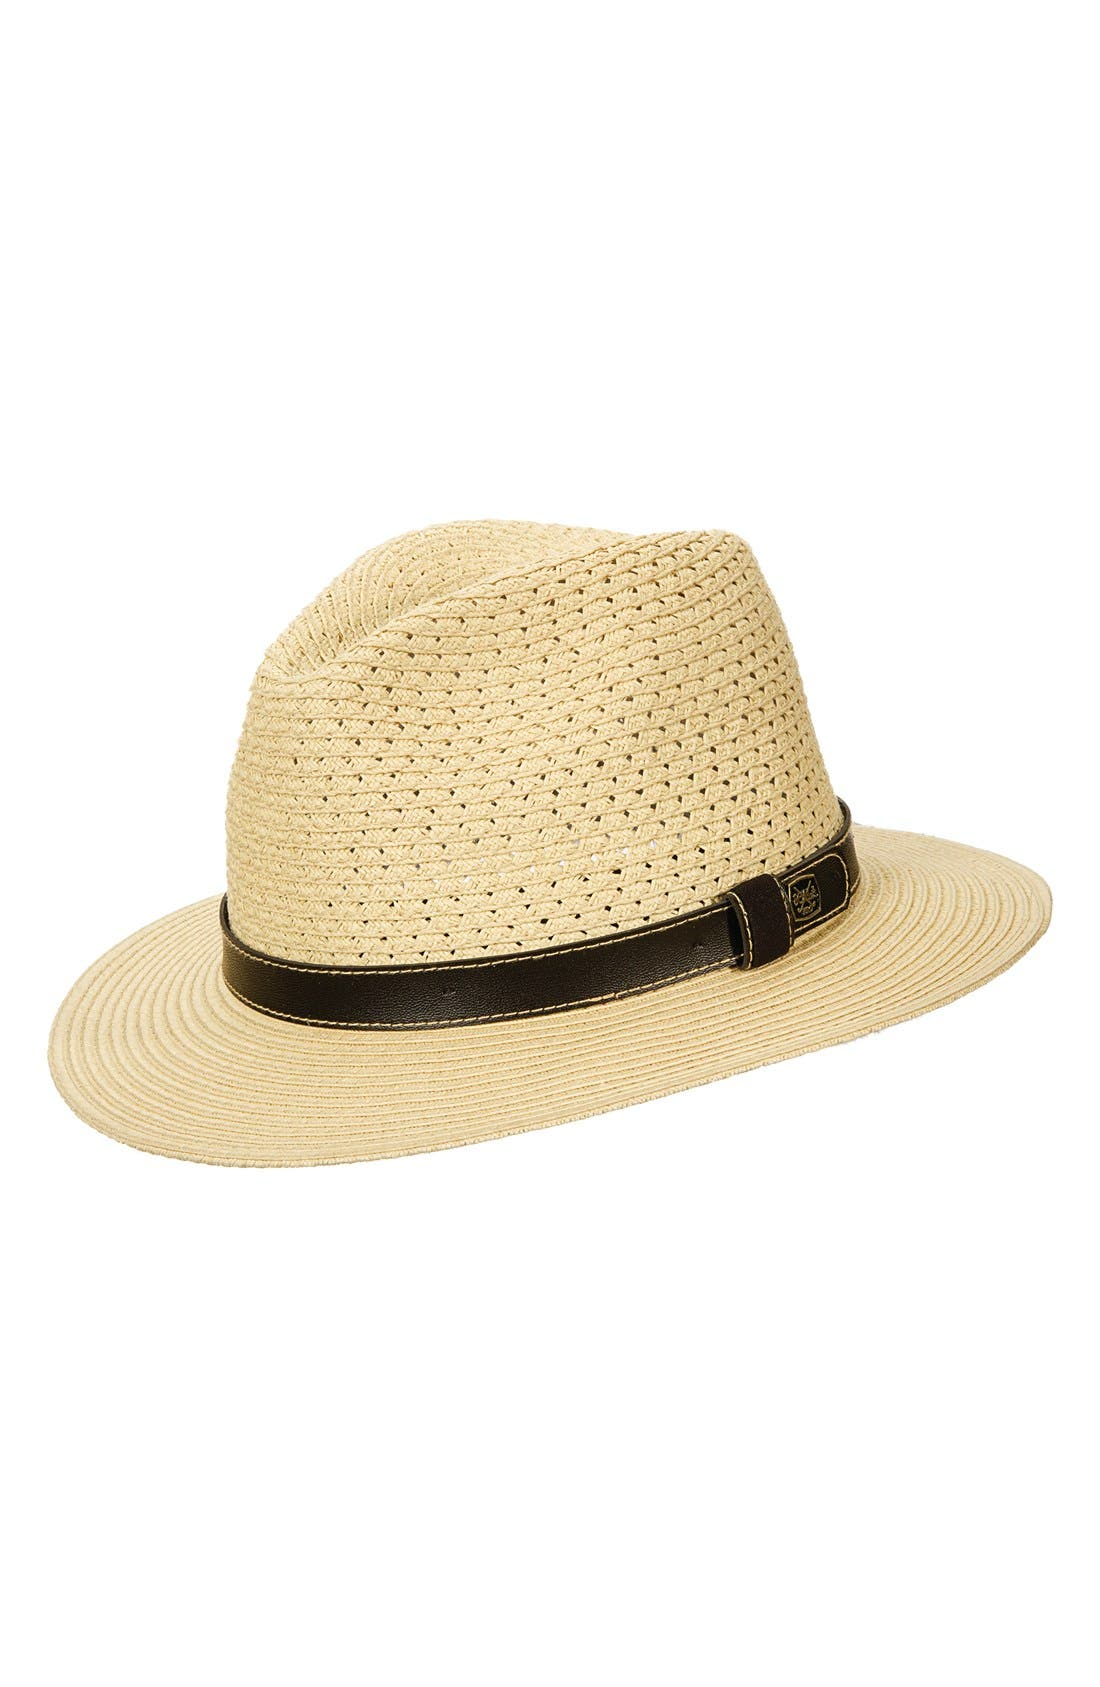 SCALA, Safari Hat, Main thumbnail 1, color, 101